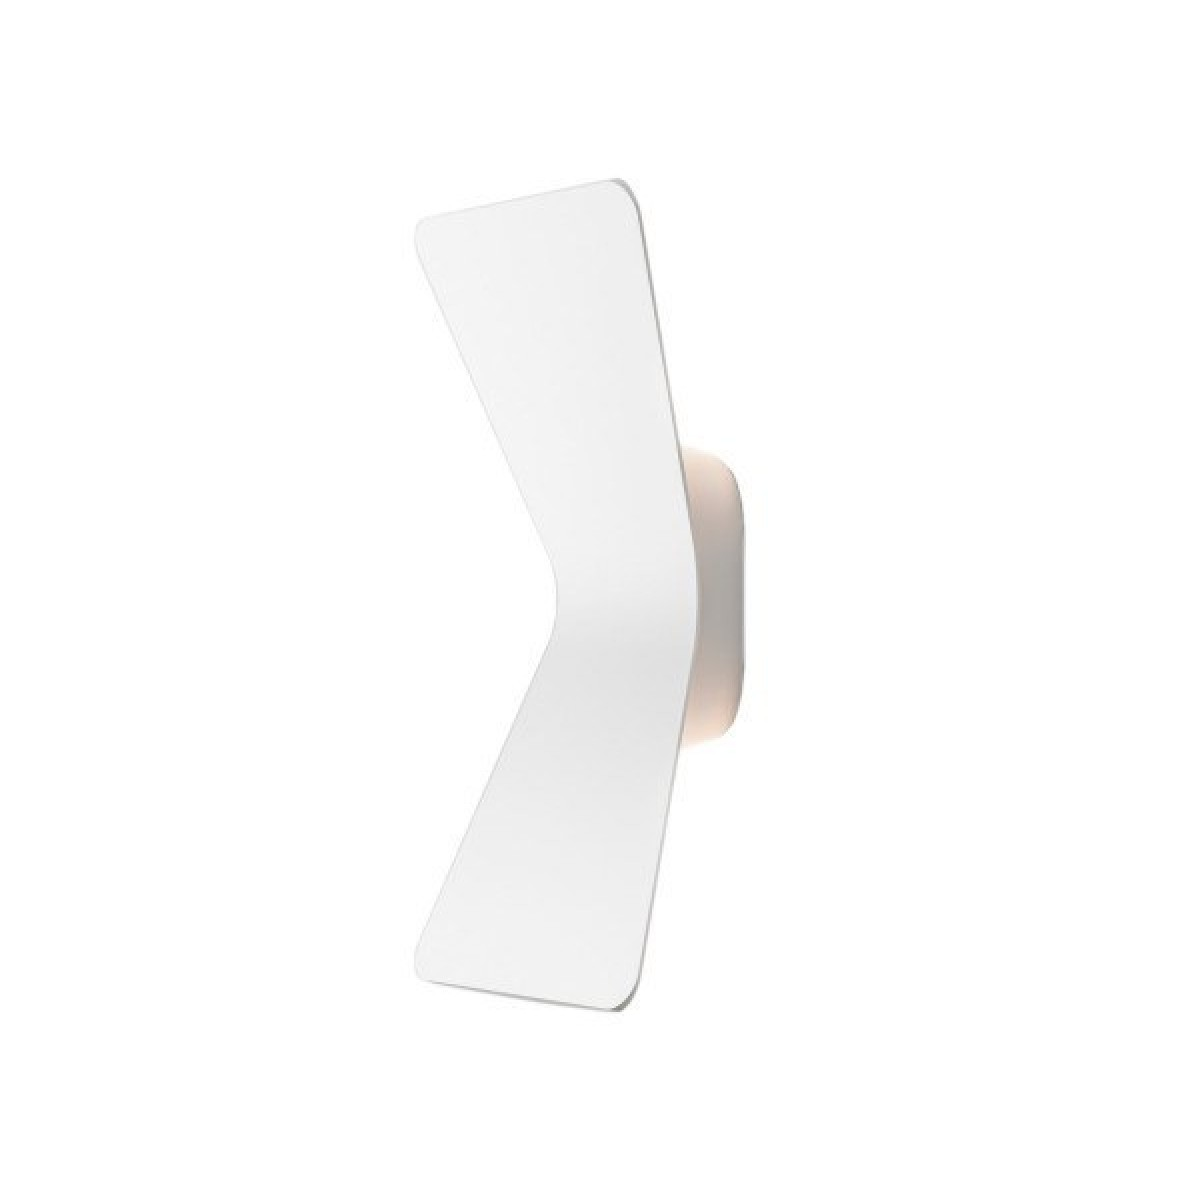 FontanaArte Flex Bianco Wall Lamp Outlet | Desout.com